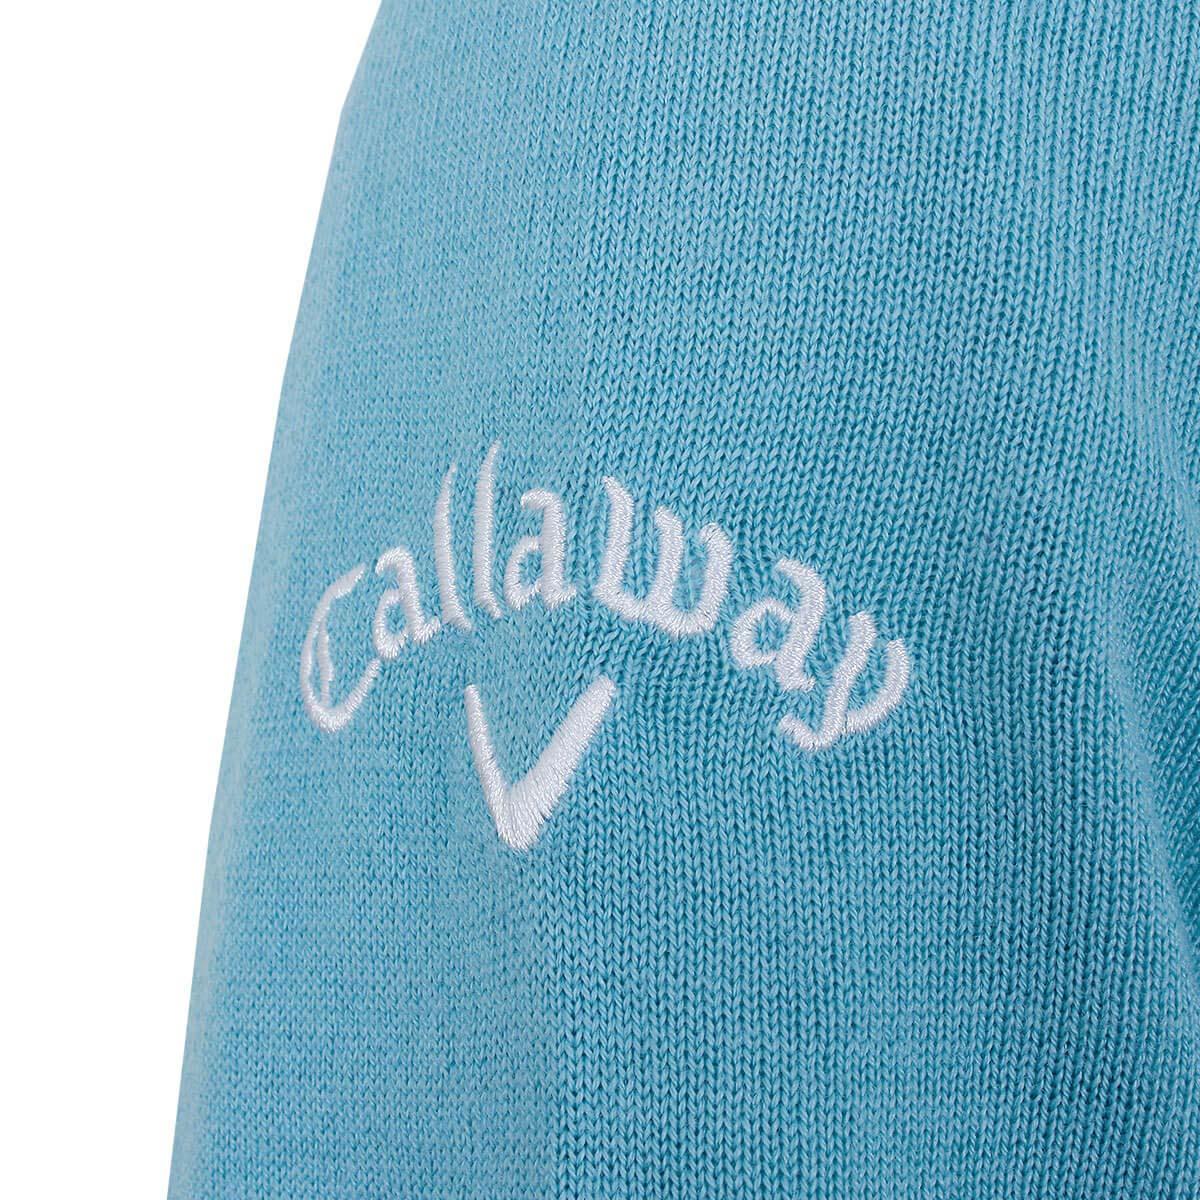 Callaway-Golf-Mens-1-4-Zip-Mock-Merino-Windproof-Sweater-Pullover-49-OFF-RRP thumbnail 7